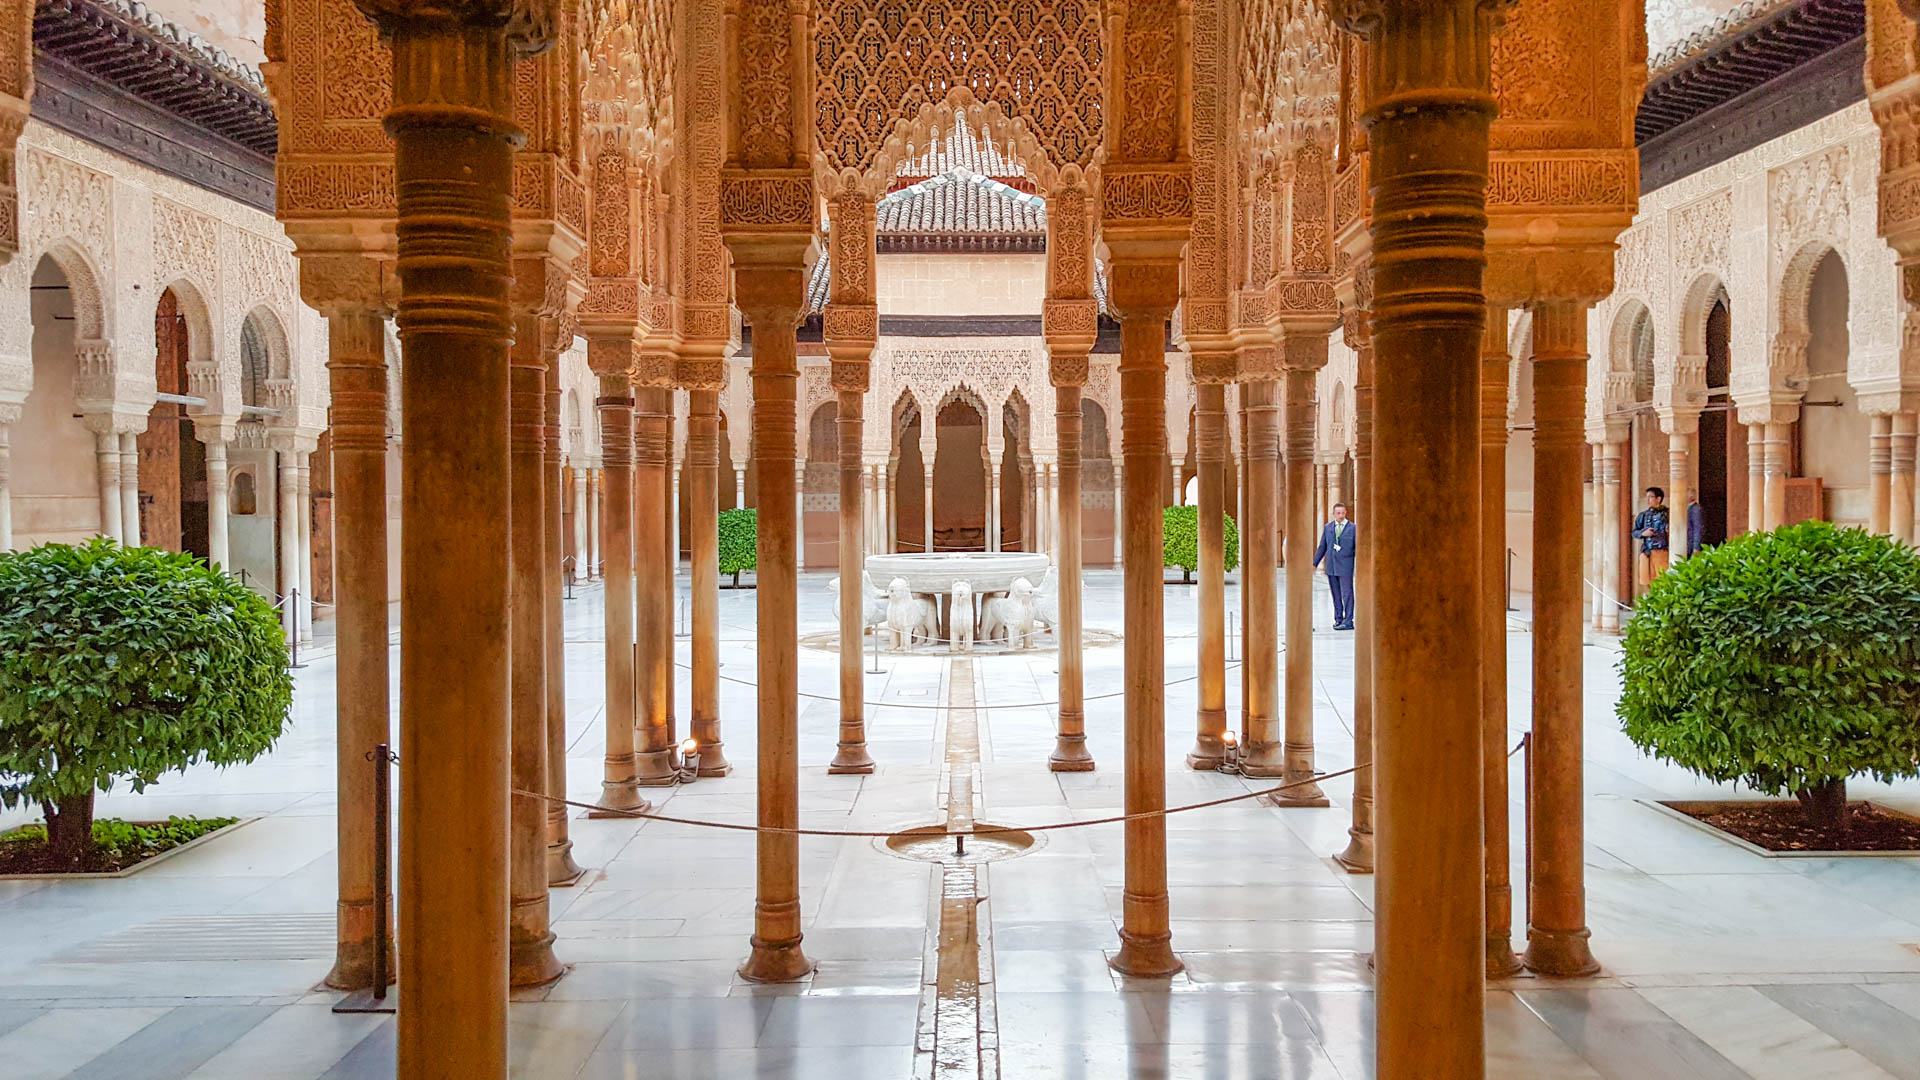 الحمرا The Alhambra